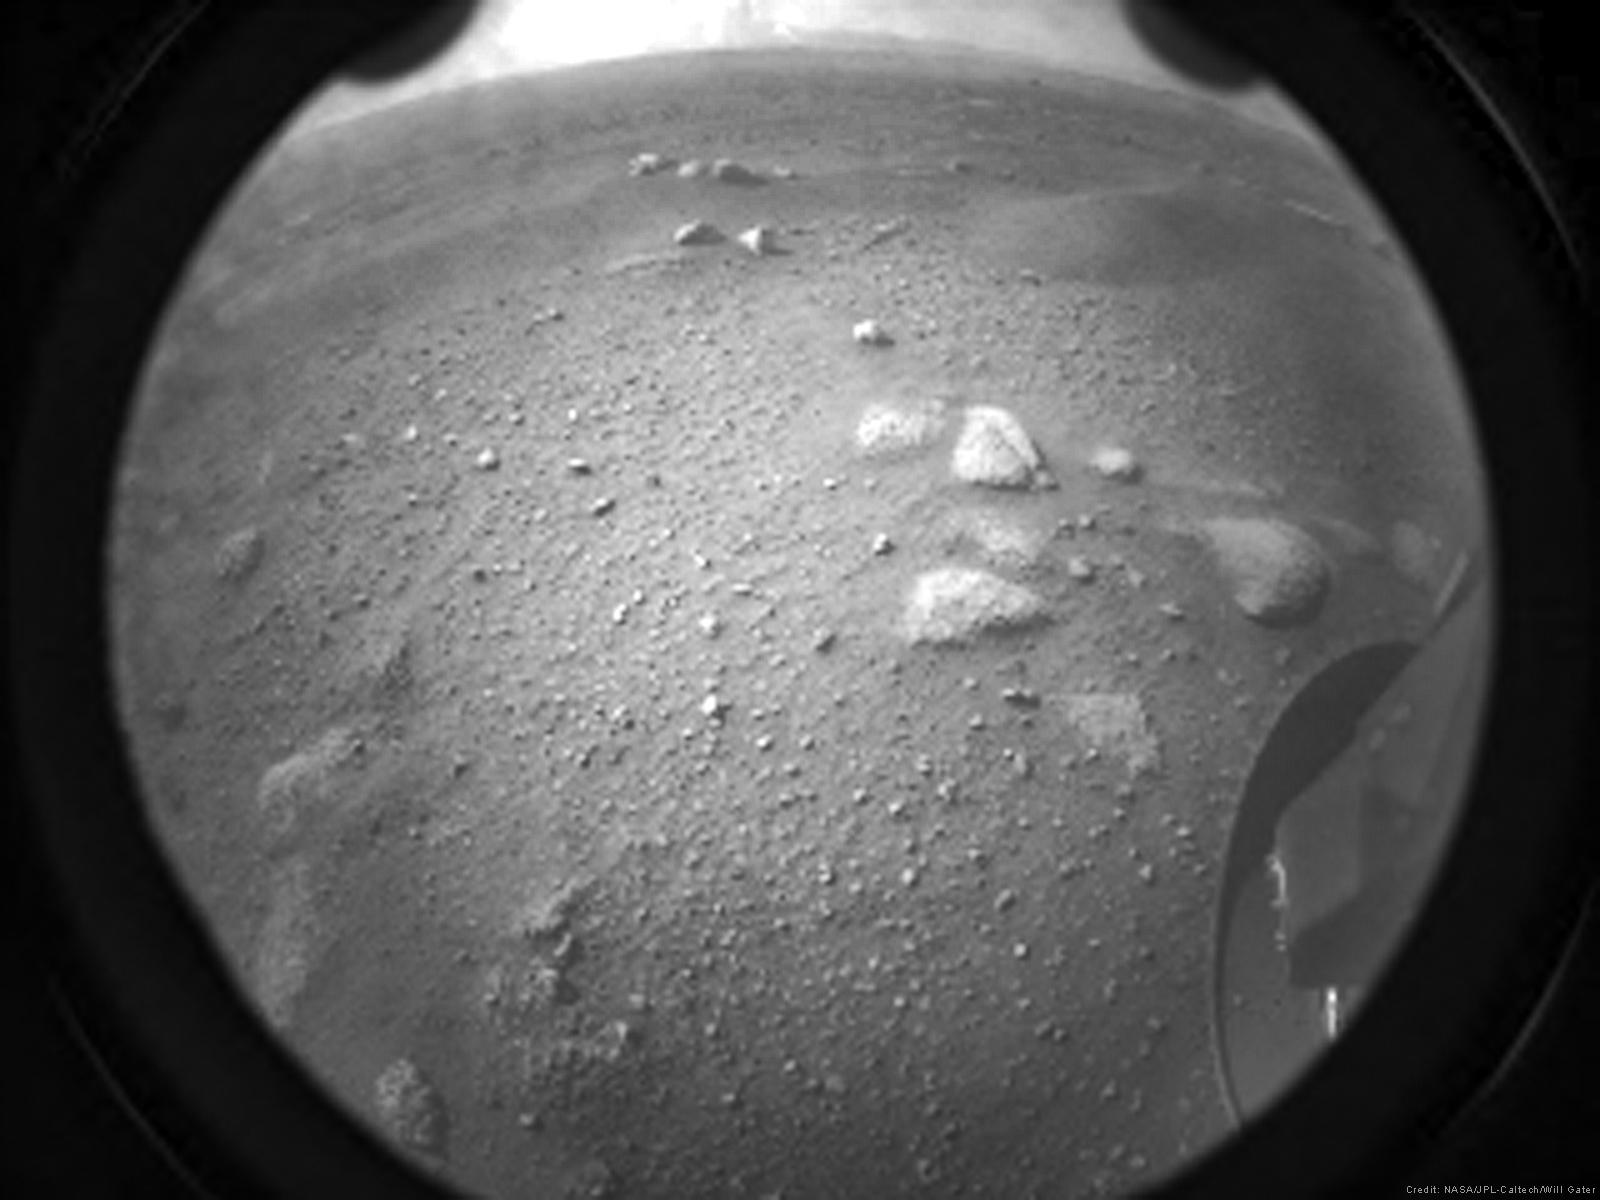 Mars 2020 (Perseverance) : Exploration du cratère Jezero 2450